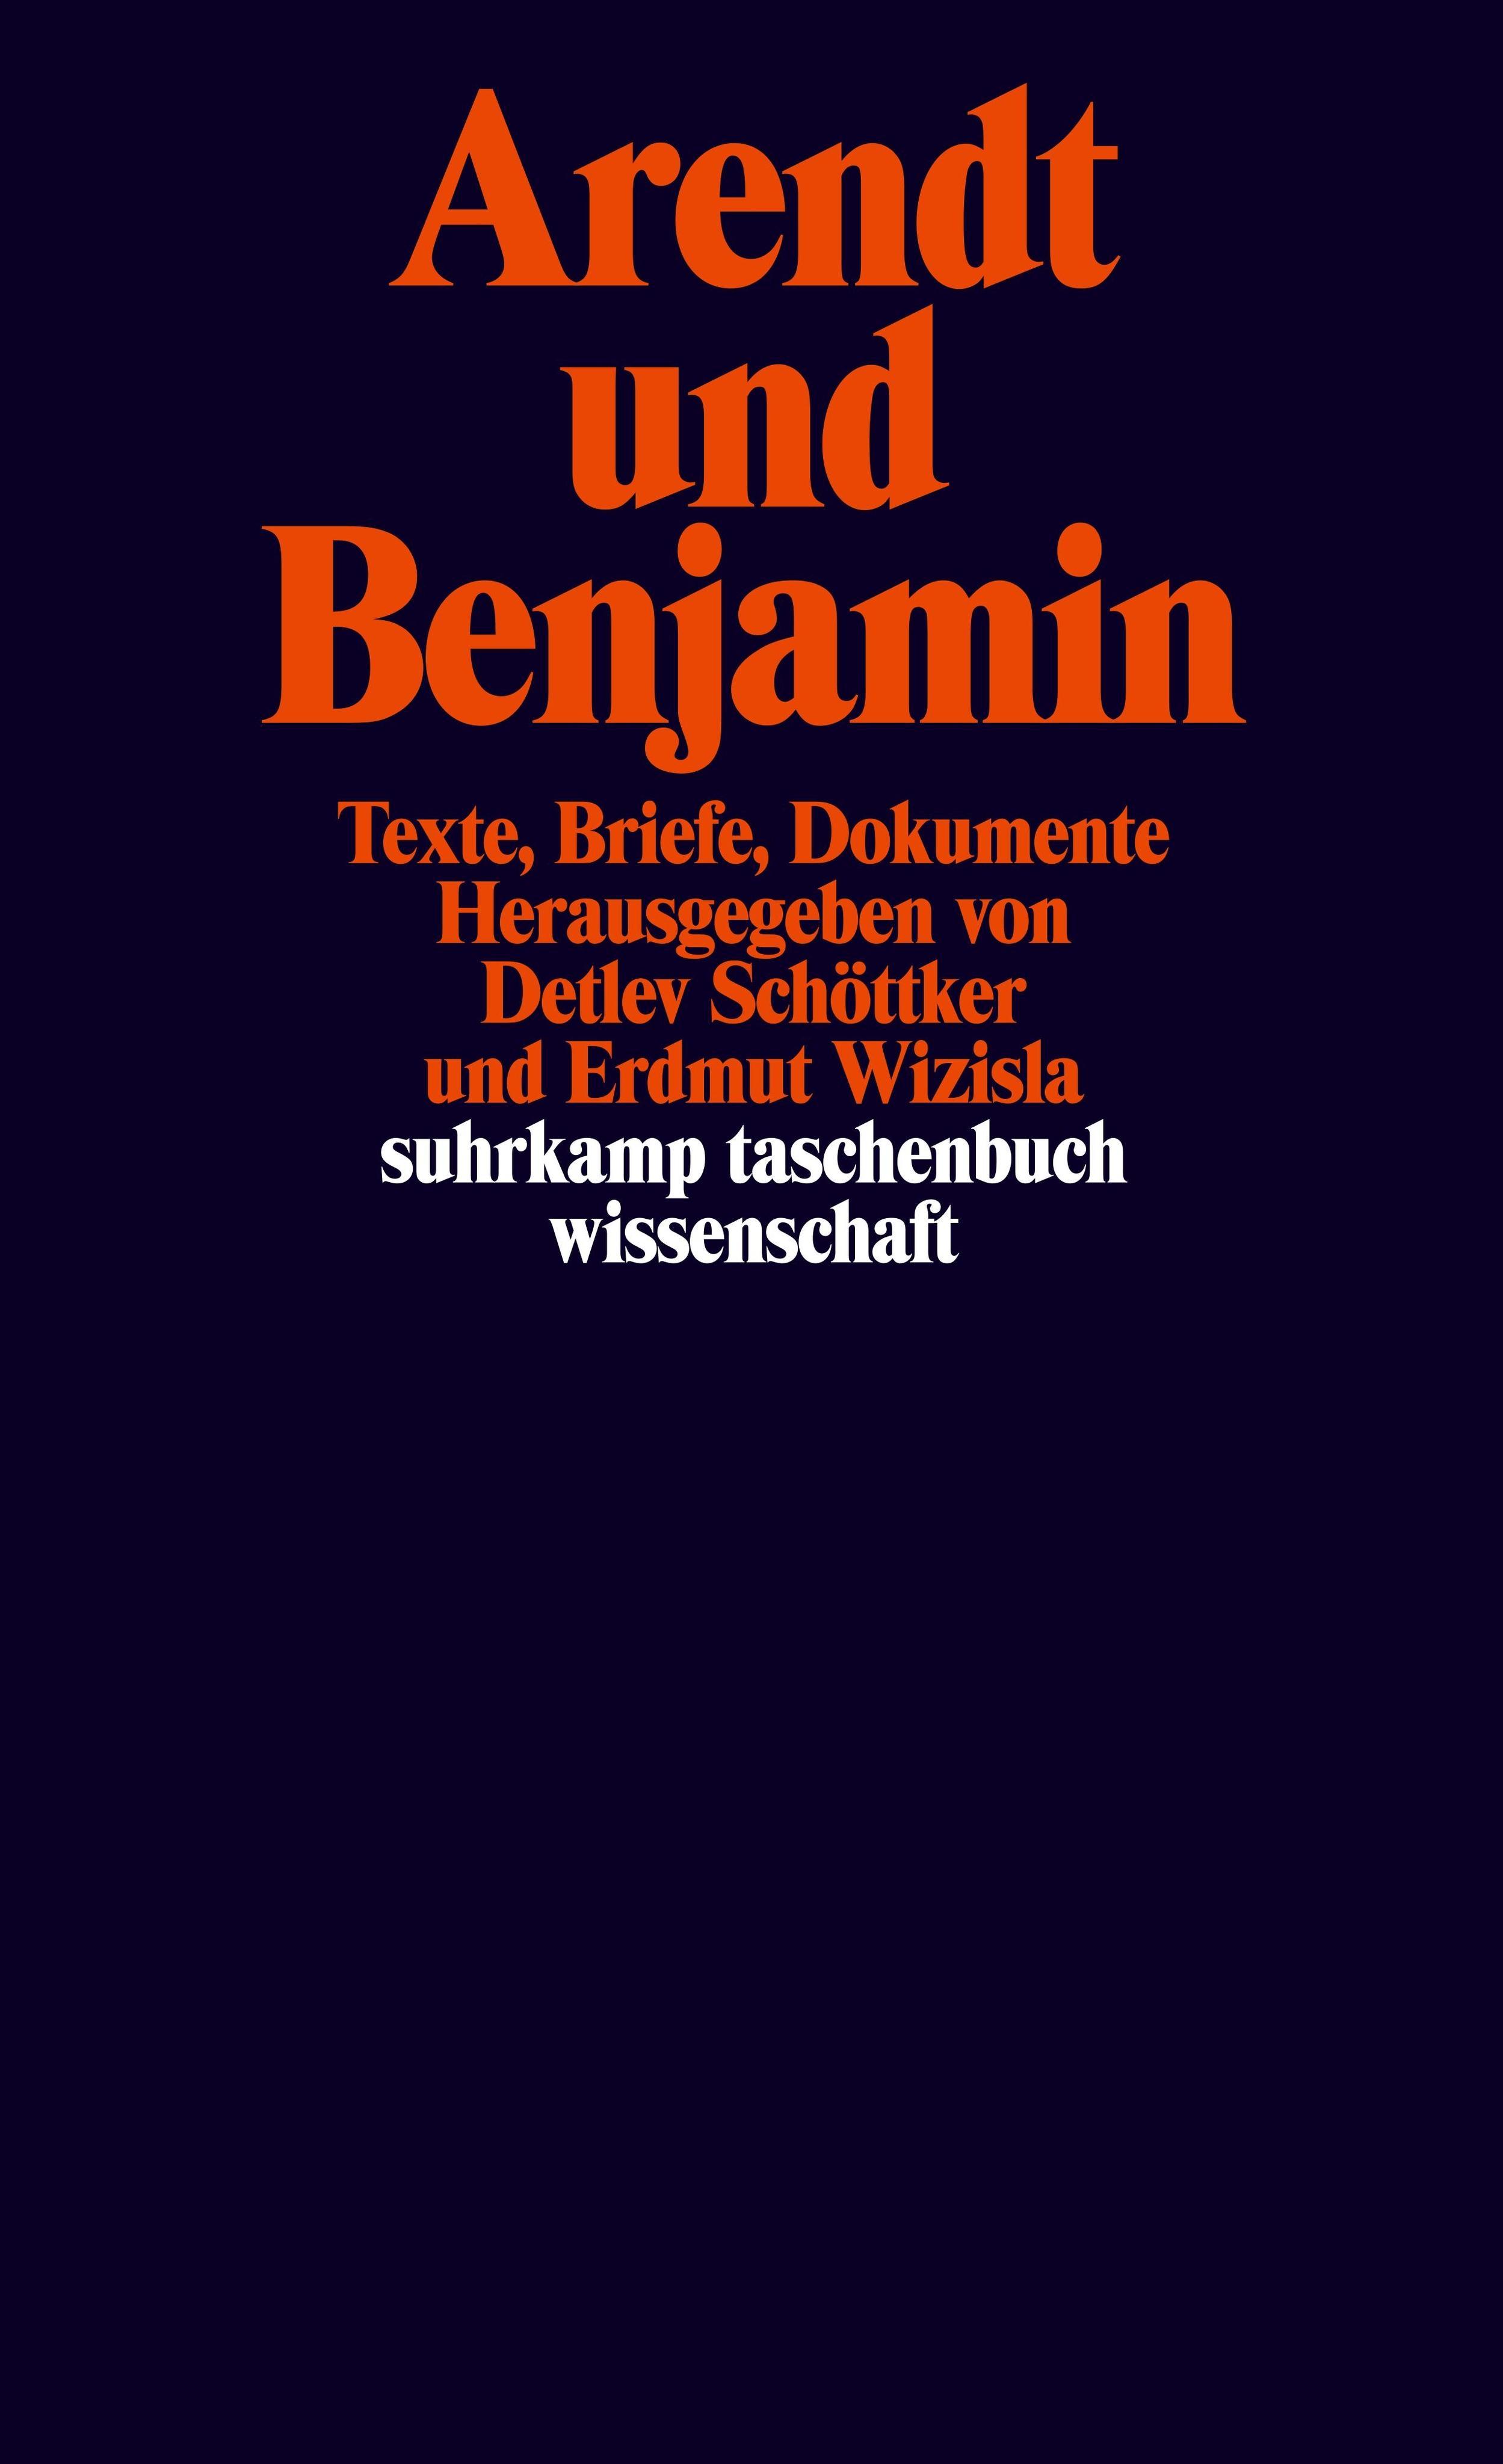 Arendt und Benjamin Detlev Schöttker